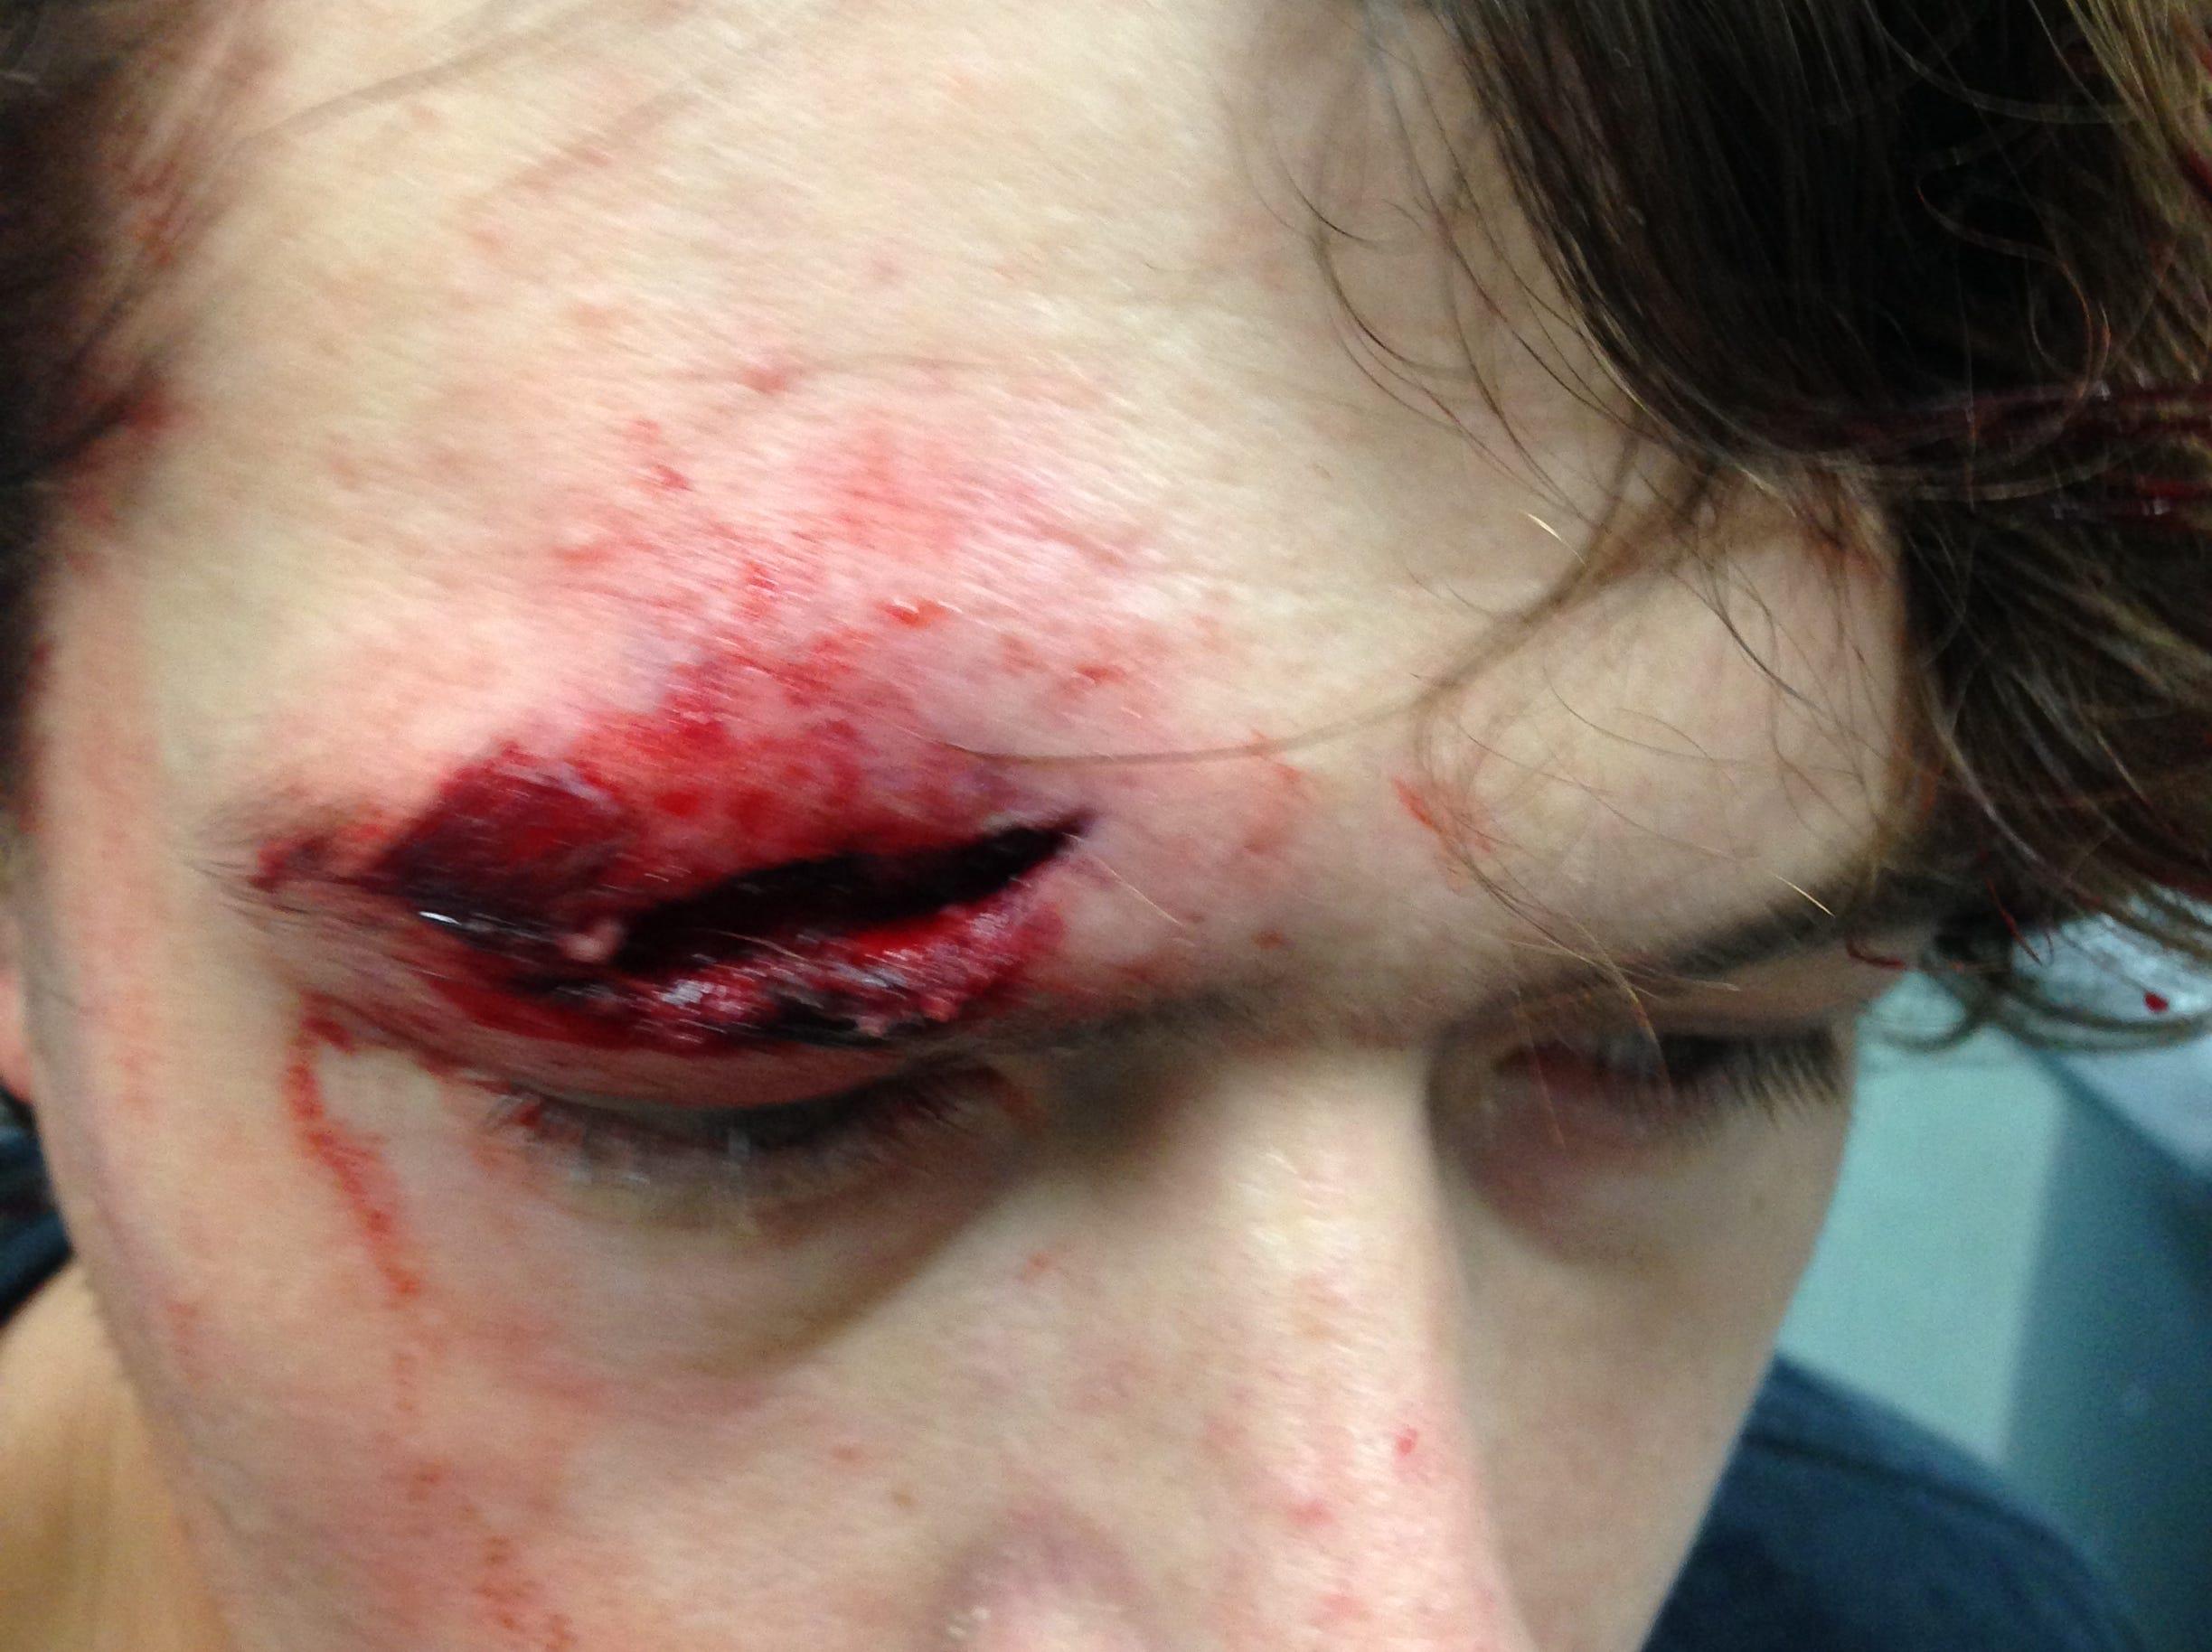 Kentucky jail video shows officer slamming inmate to floor